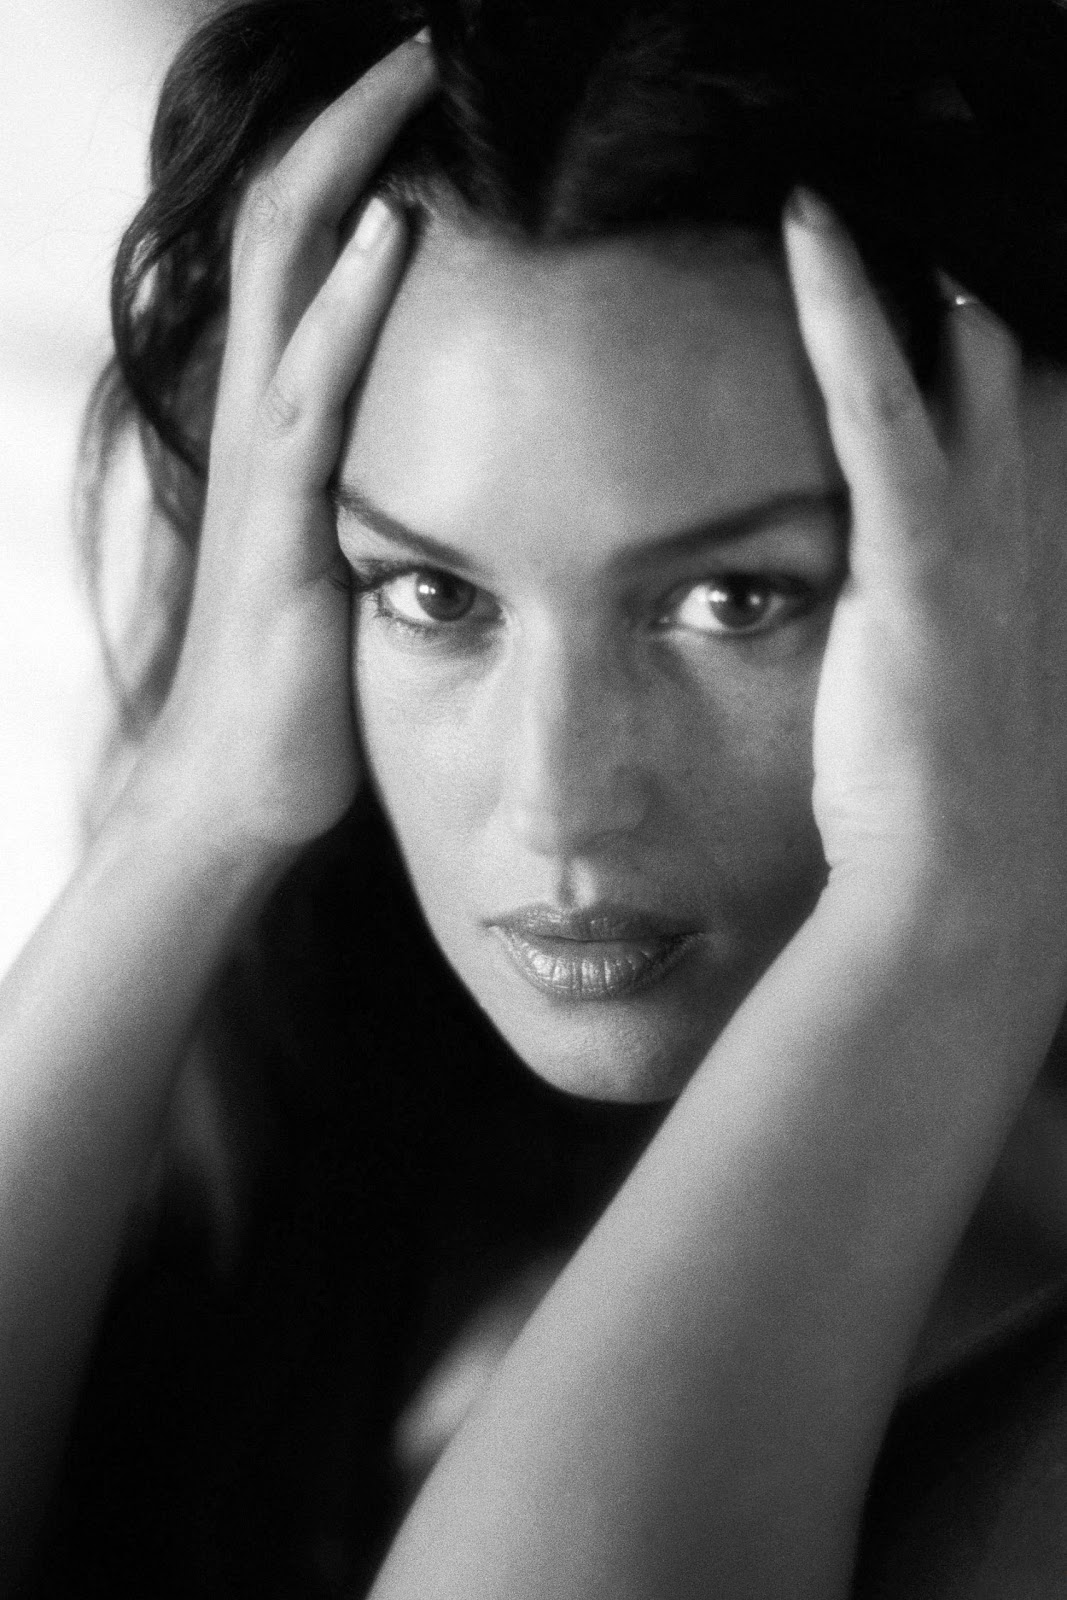 http://2.bp.blogspot.com/-wCf0rCm-cek/TePM-2yJz9I/AAAAAAAAKVw/5C5hFuw0fKg/s1600/monica-belluci-black-white-modeling-photography-old-style+%25281%2529.jpg